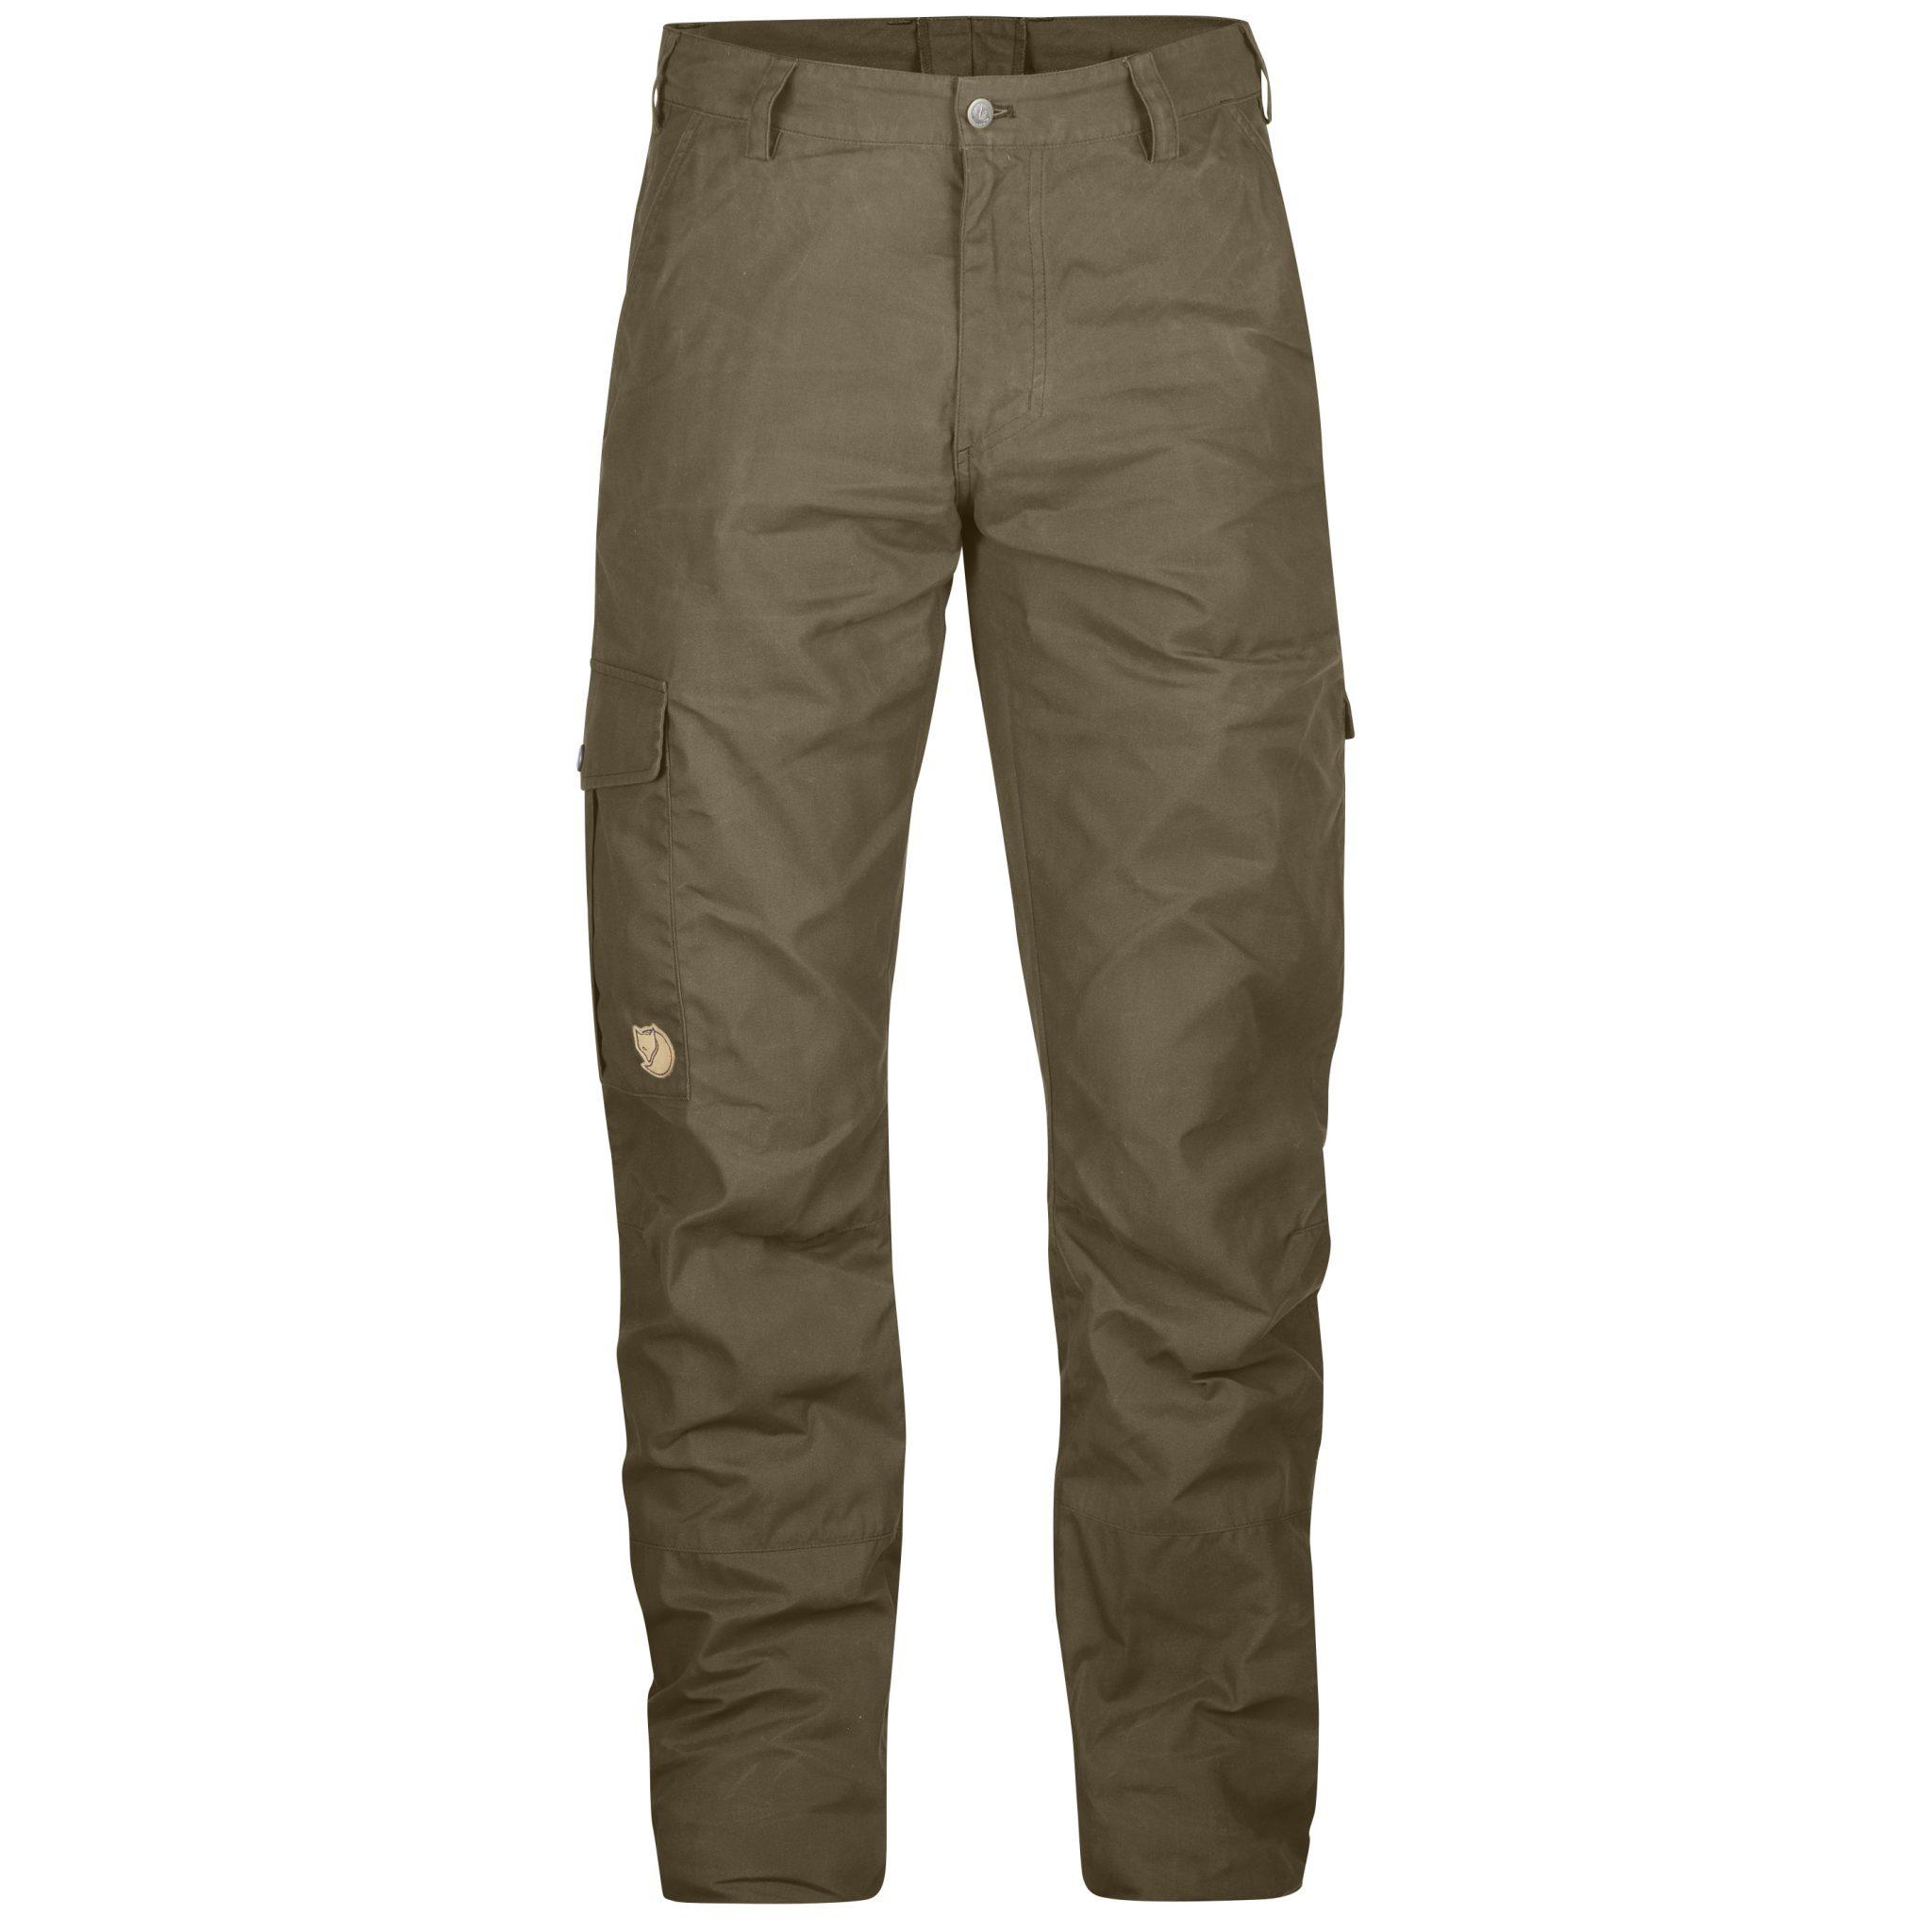 Fjällräven Övik Trousers | Taupe